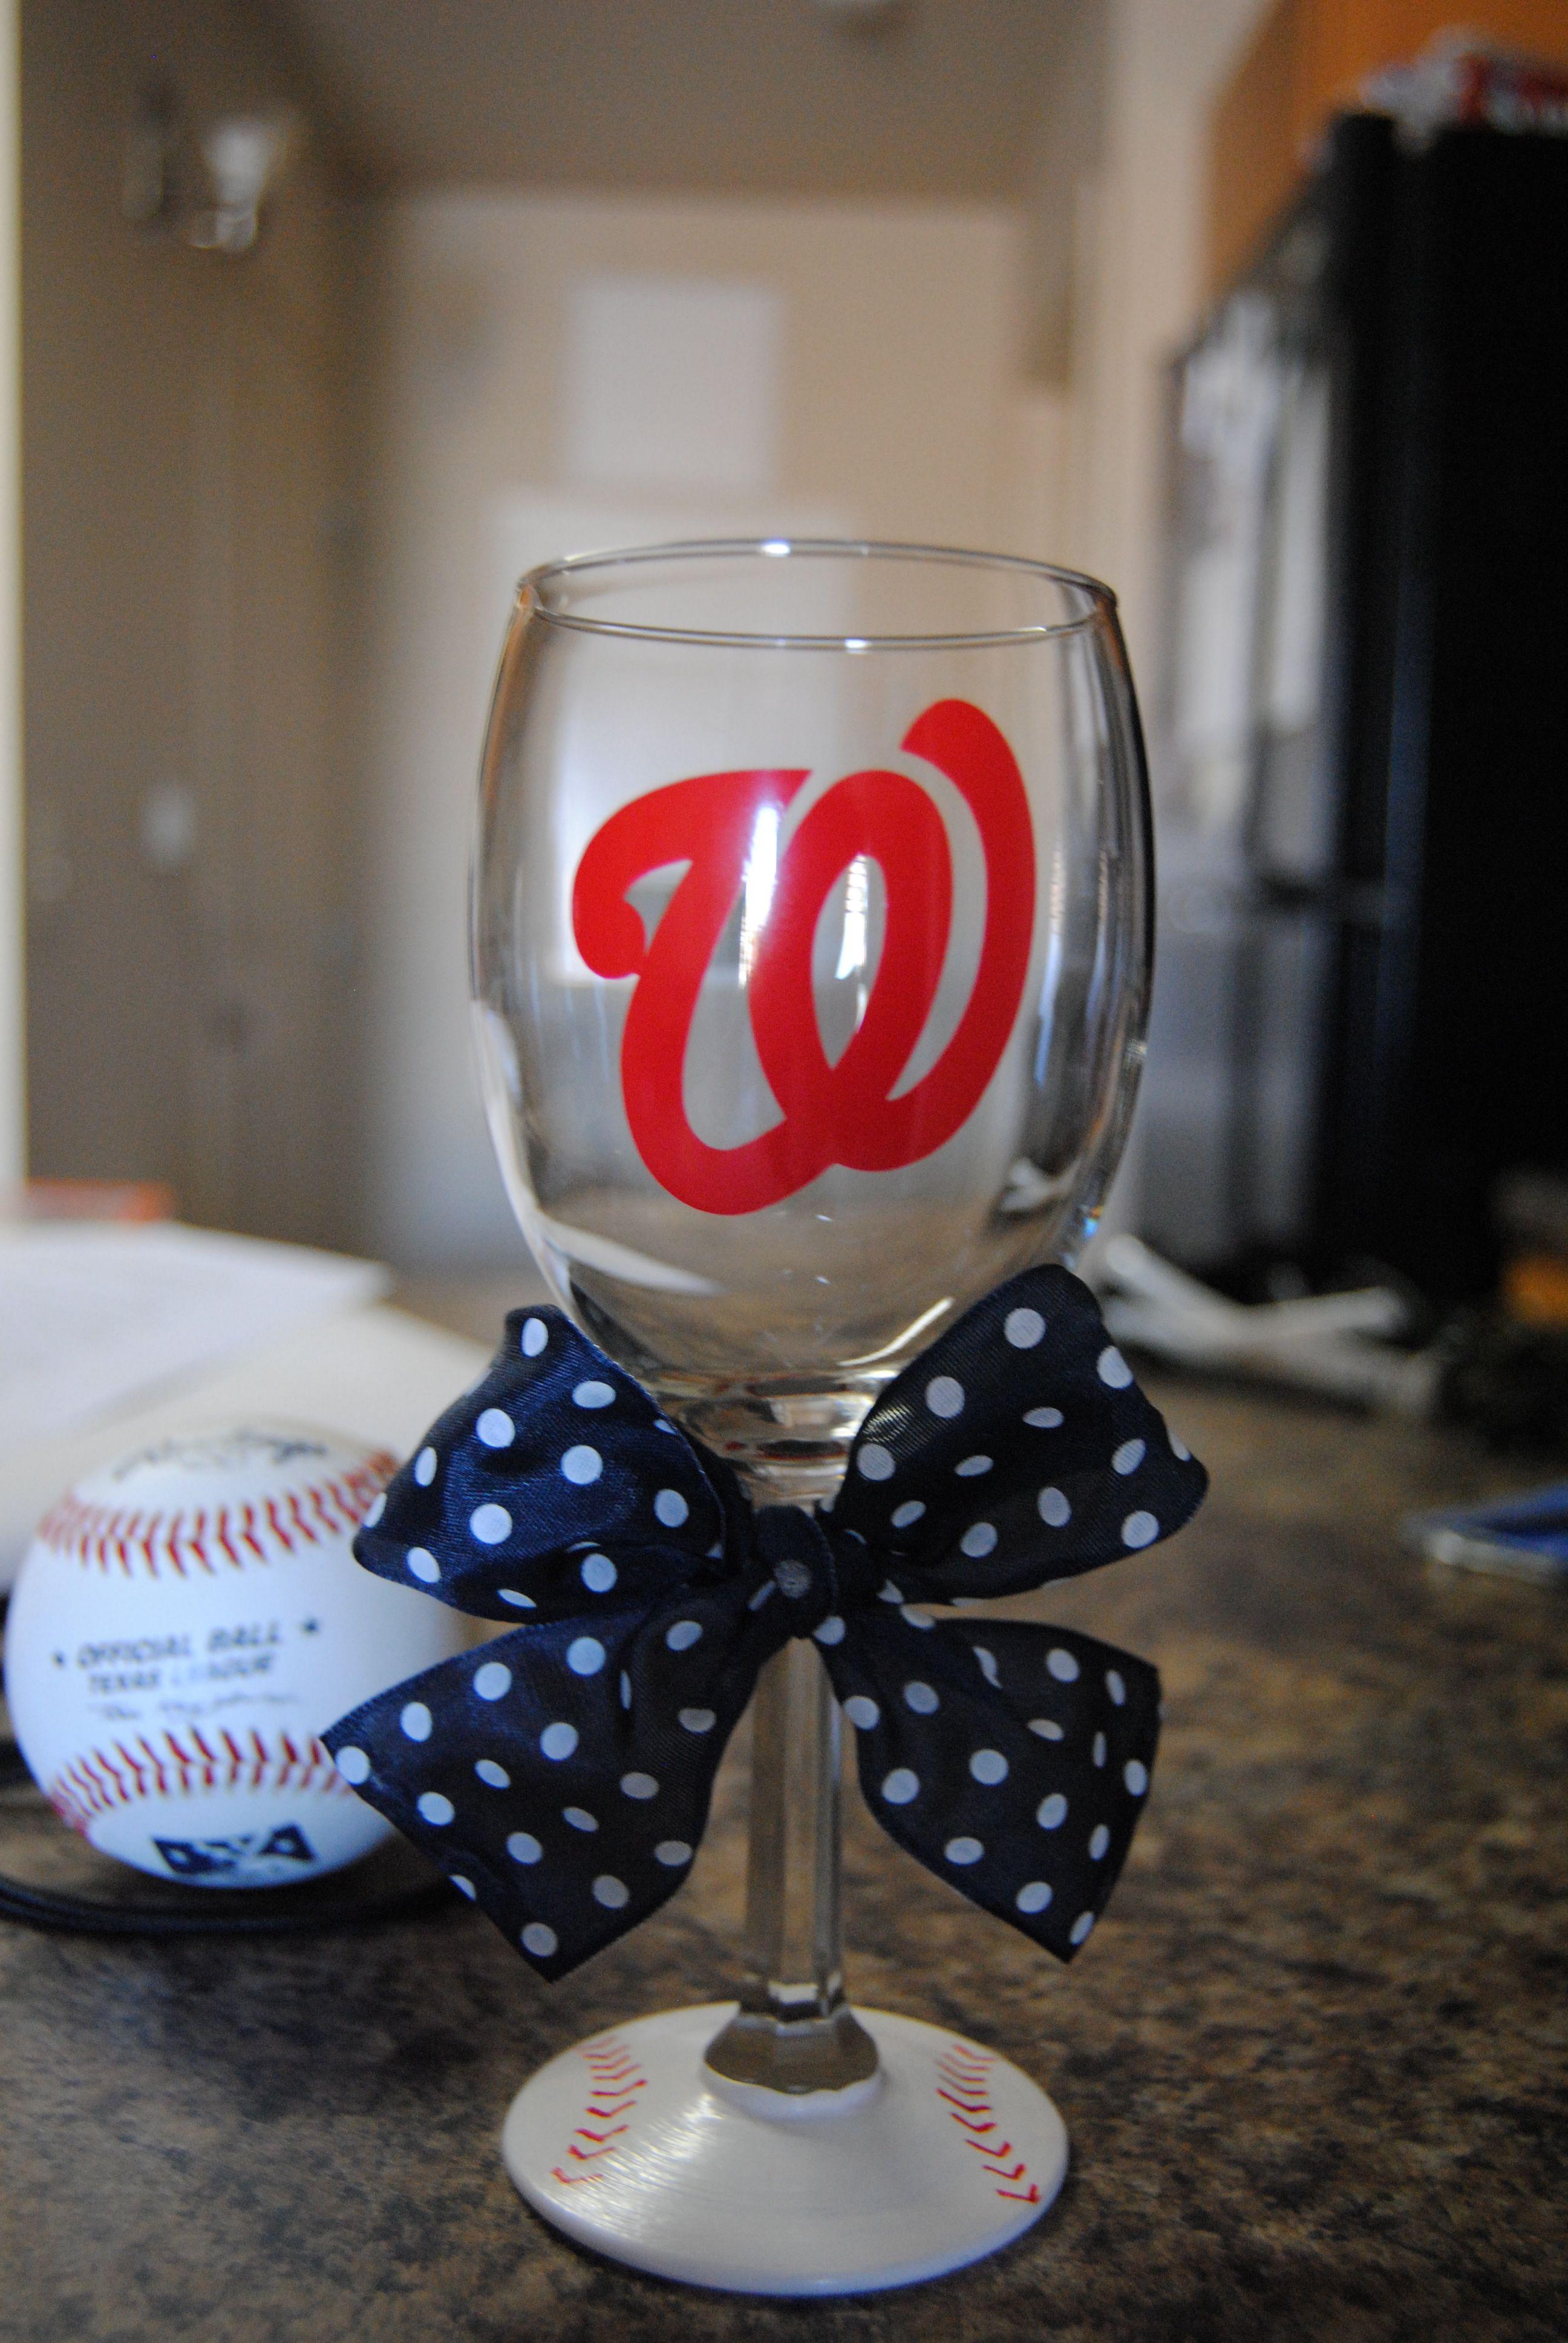 Washington Nationals Http Www Etsy Com Listing 95442678 Washington Nationals Wine Glass Washington Nationals Washington Nationals Baseball Baseball Season